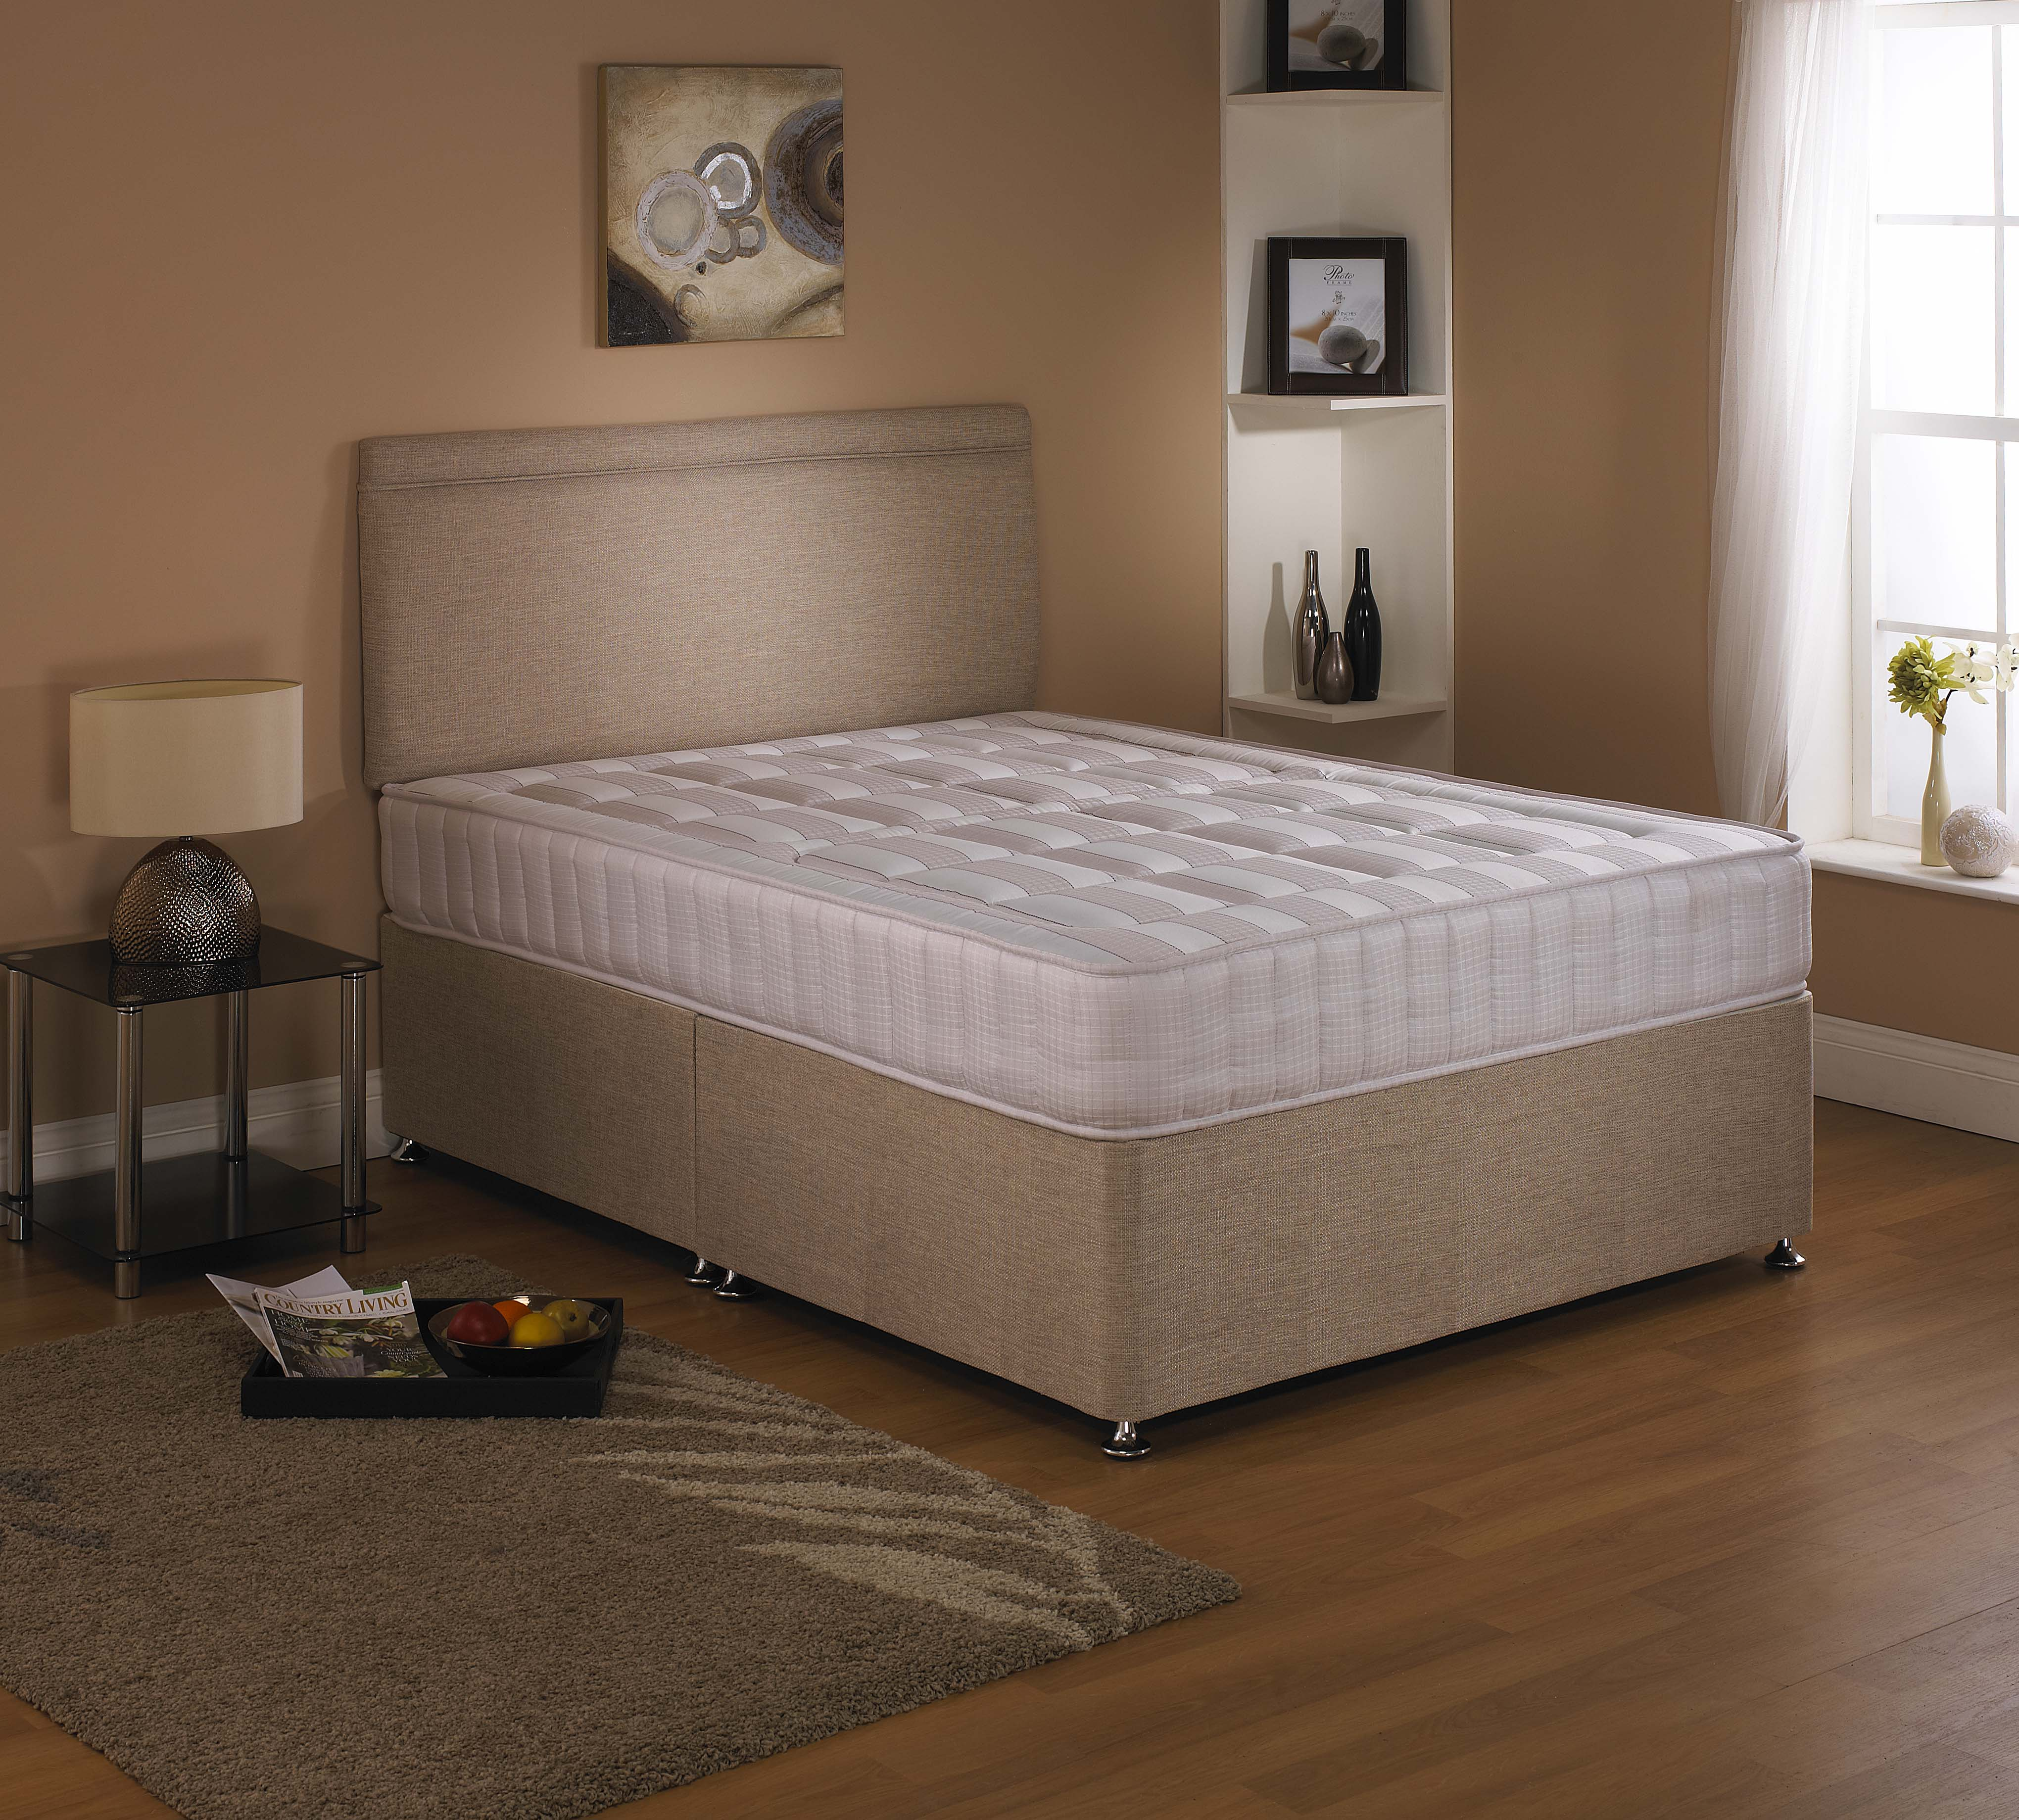 dream sofas wishaw modern wooden sofa designs for living room divan beds